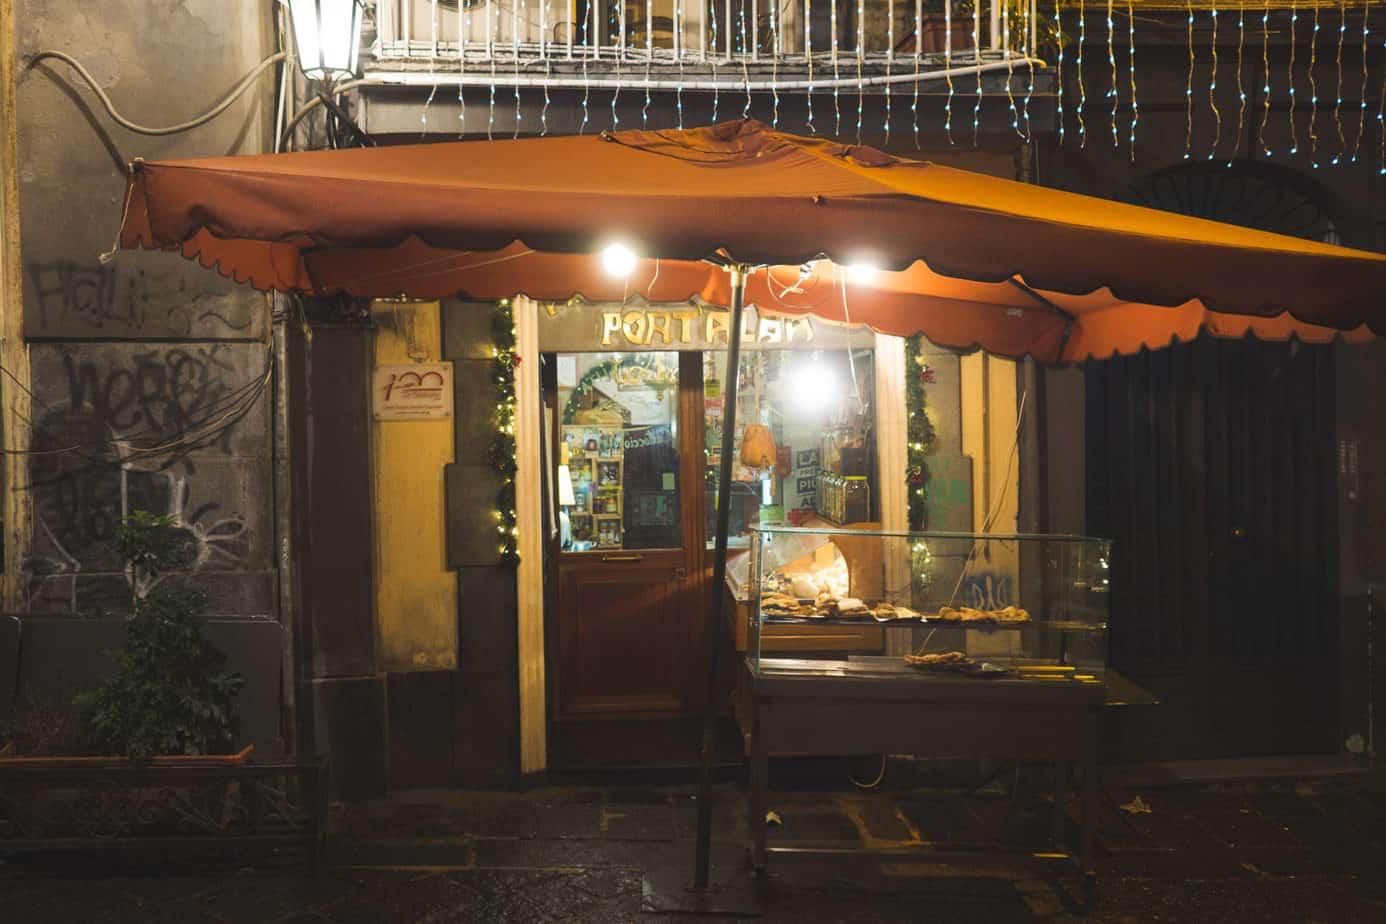 antica pizzeria porta alba